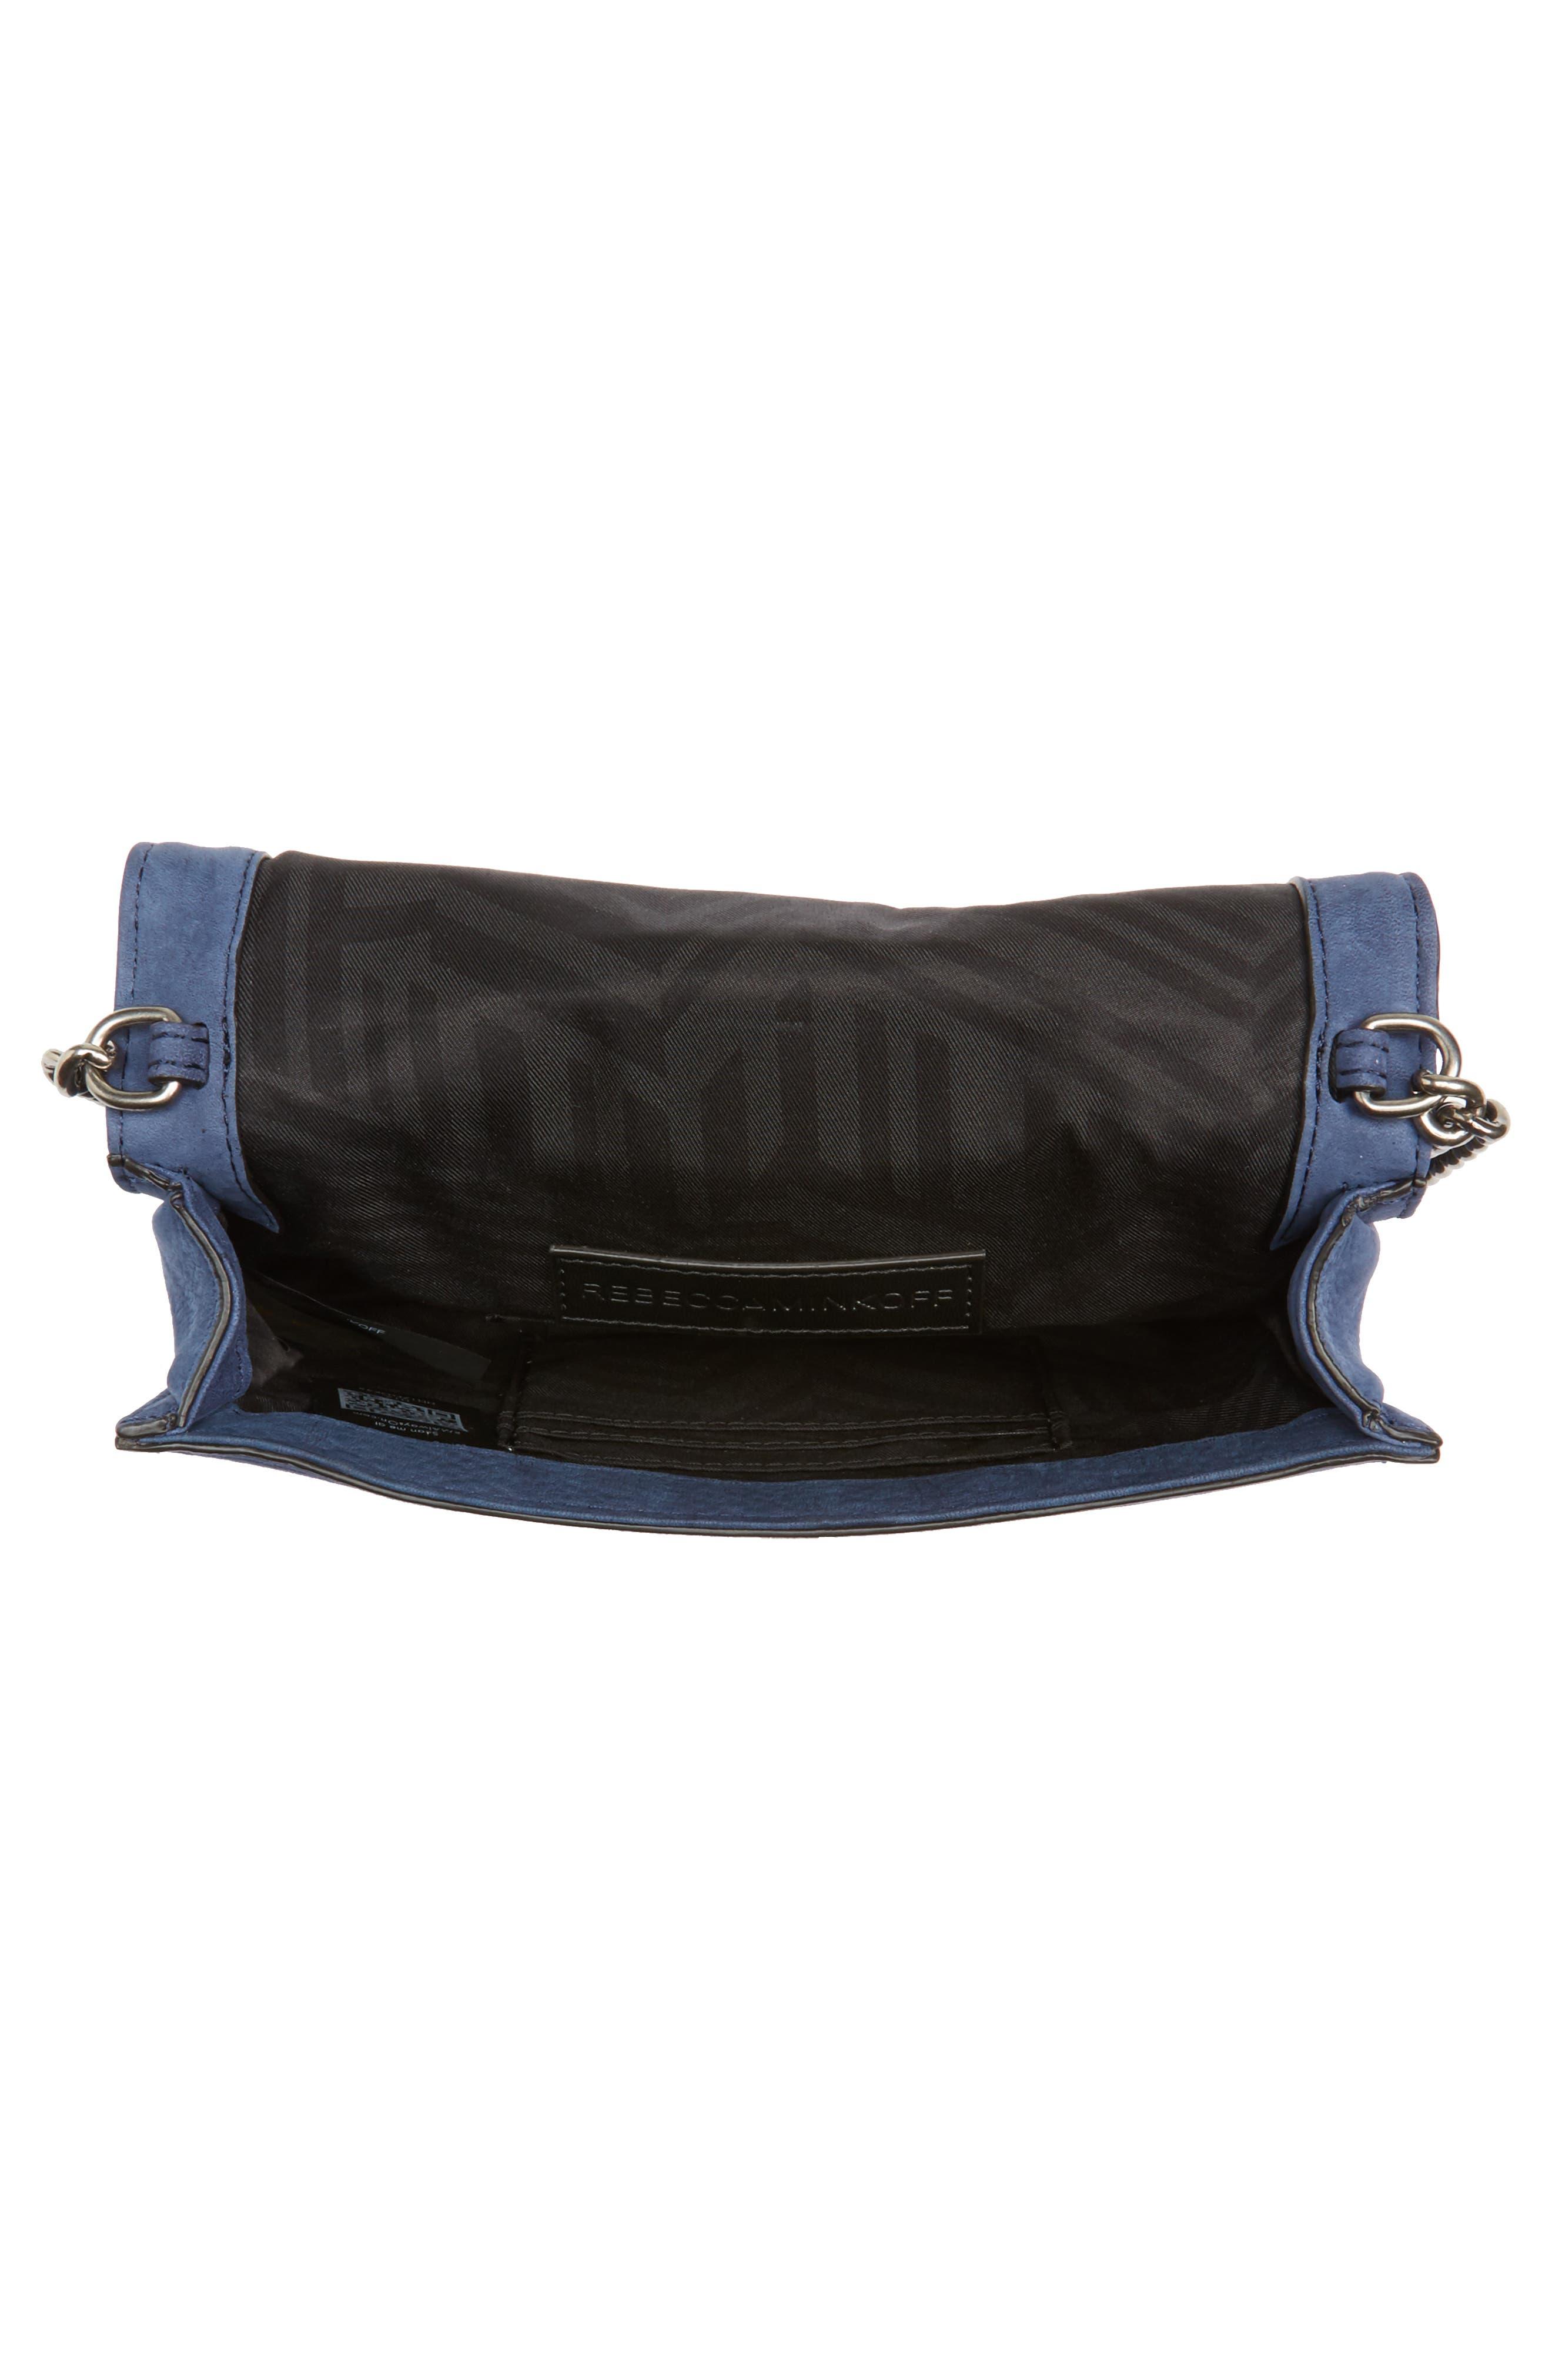 Small Love Nubuck Leather Crossbody Bag,                             Alternate thumbnail 19, color,